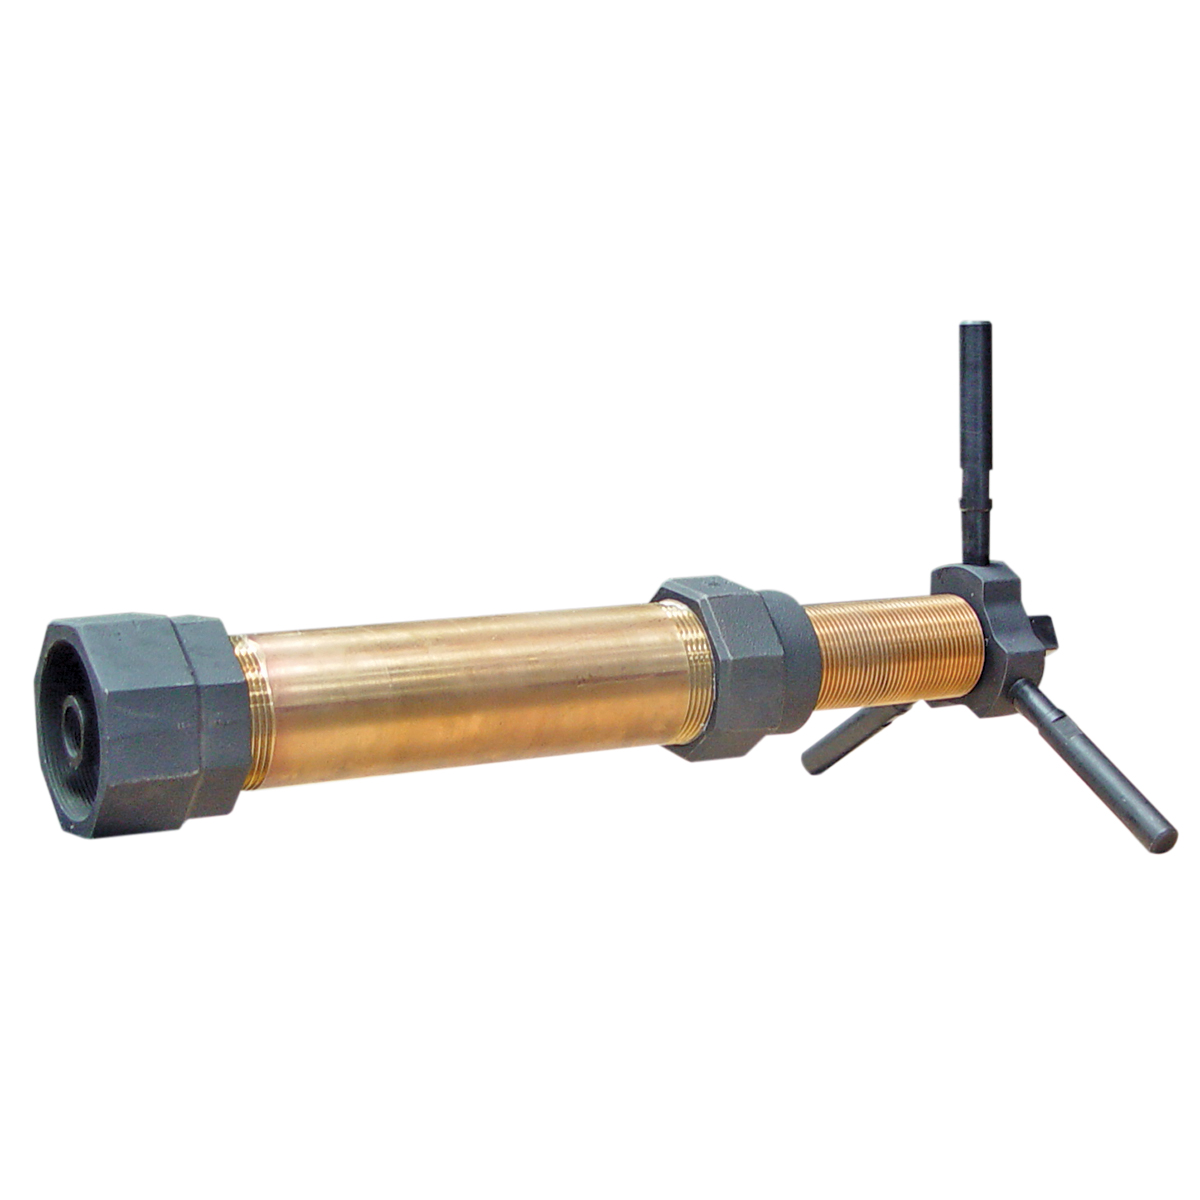 5935 - Pipe drilling machine